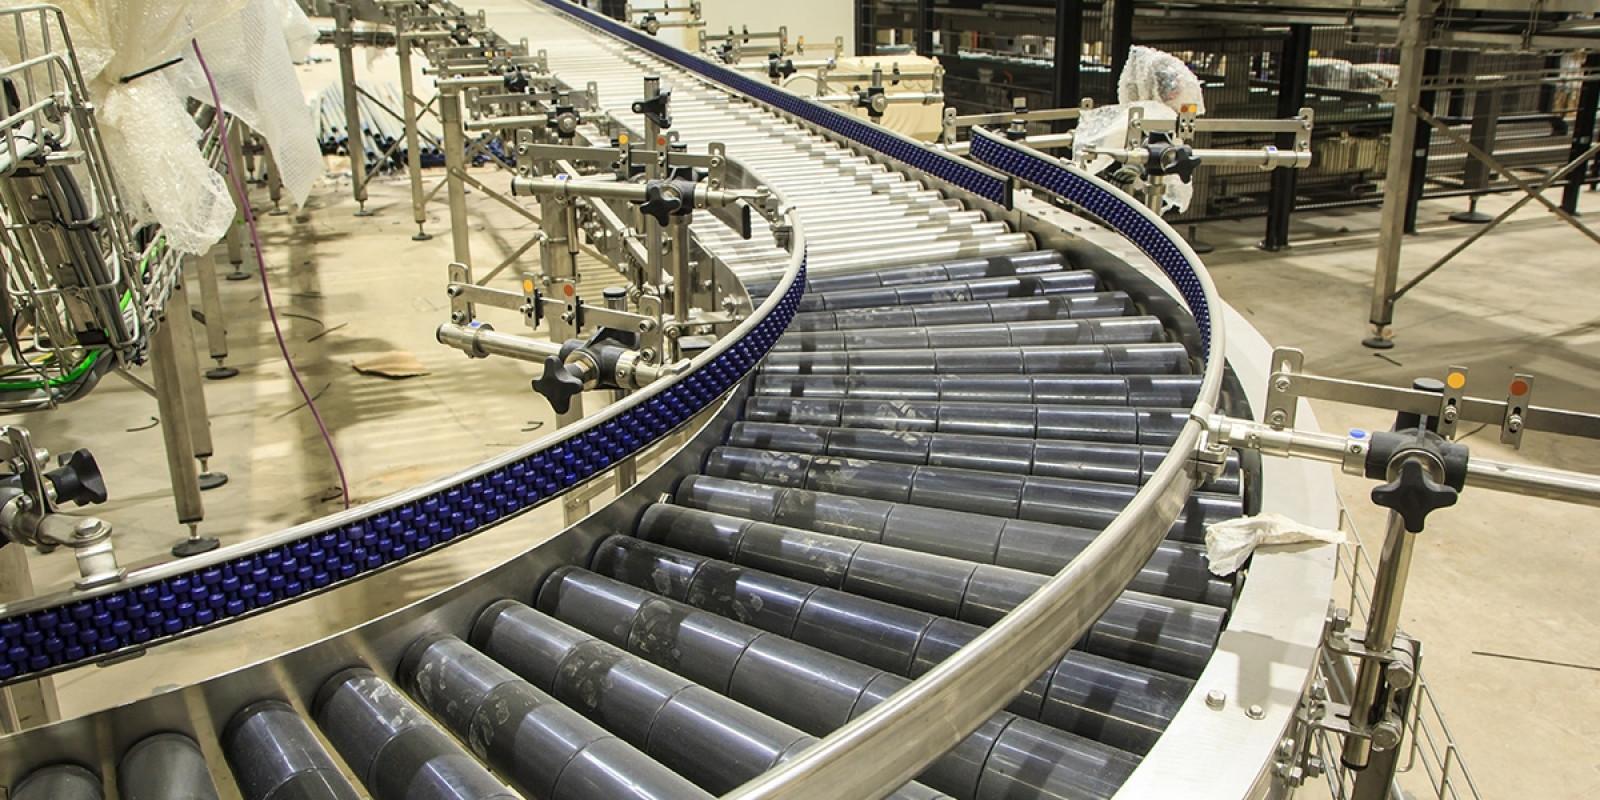 Conveyor Belt in a Factory